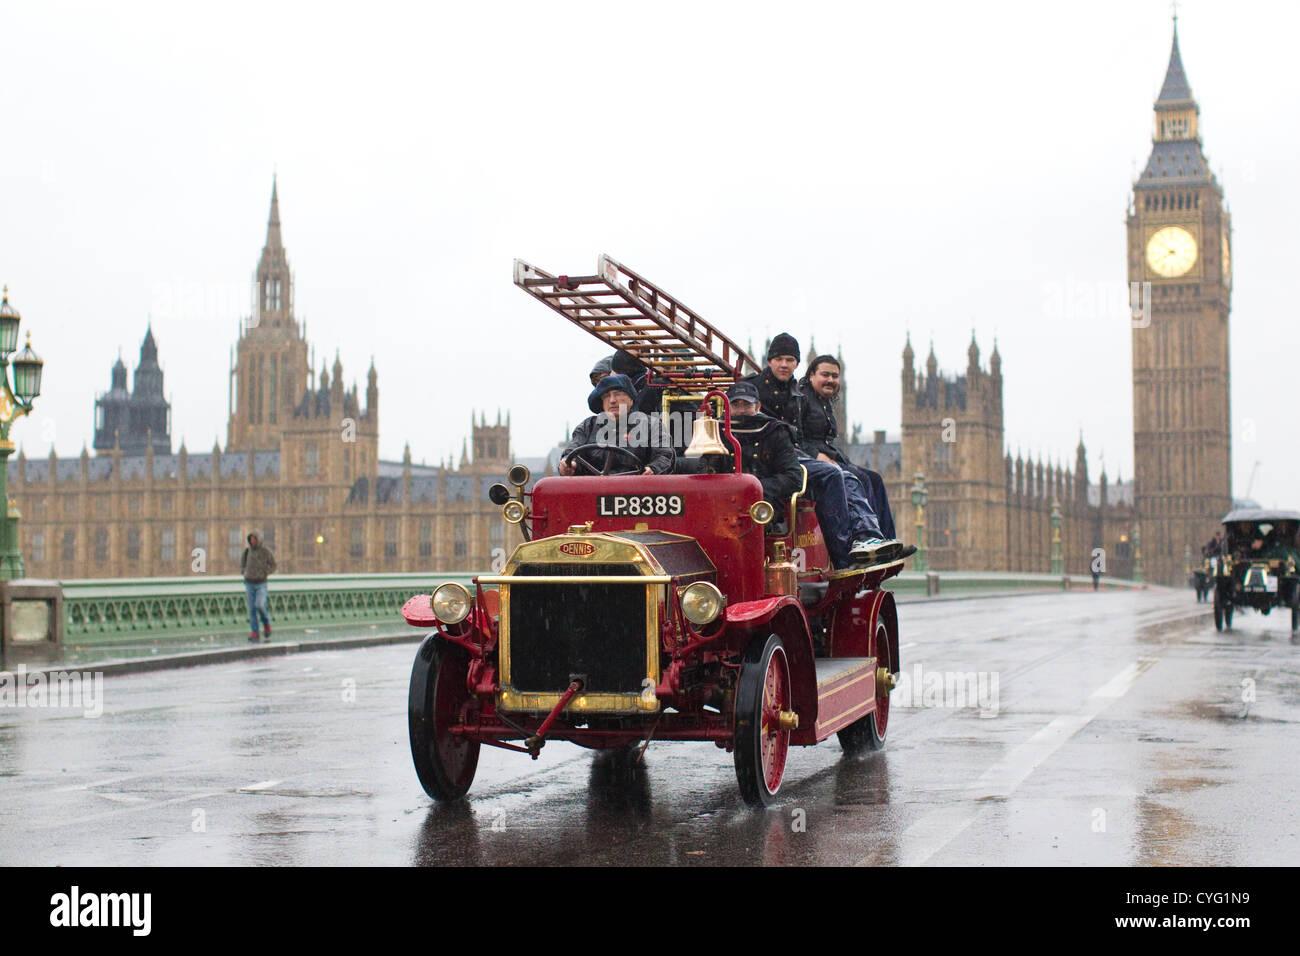 Royal Automobile Club's annual Veteran Car Run London to Brighton. 04.11.2012 Picture shows 1916 Dennis Fire - Stock Image